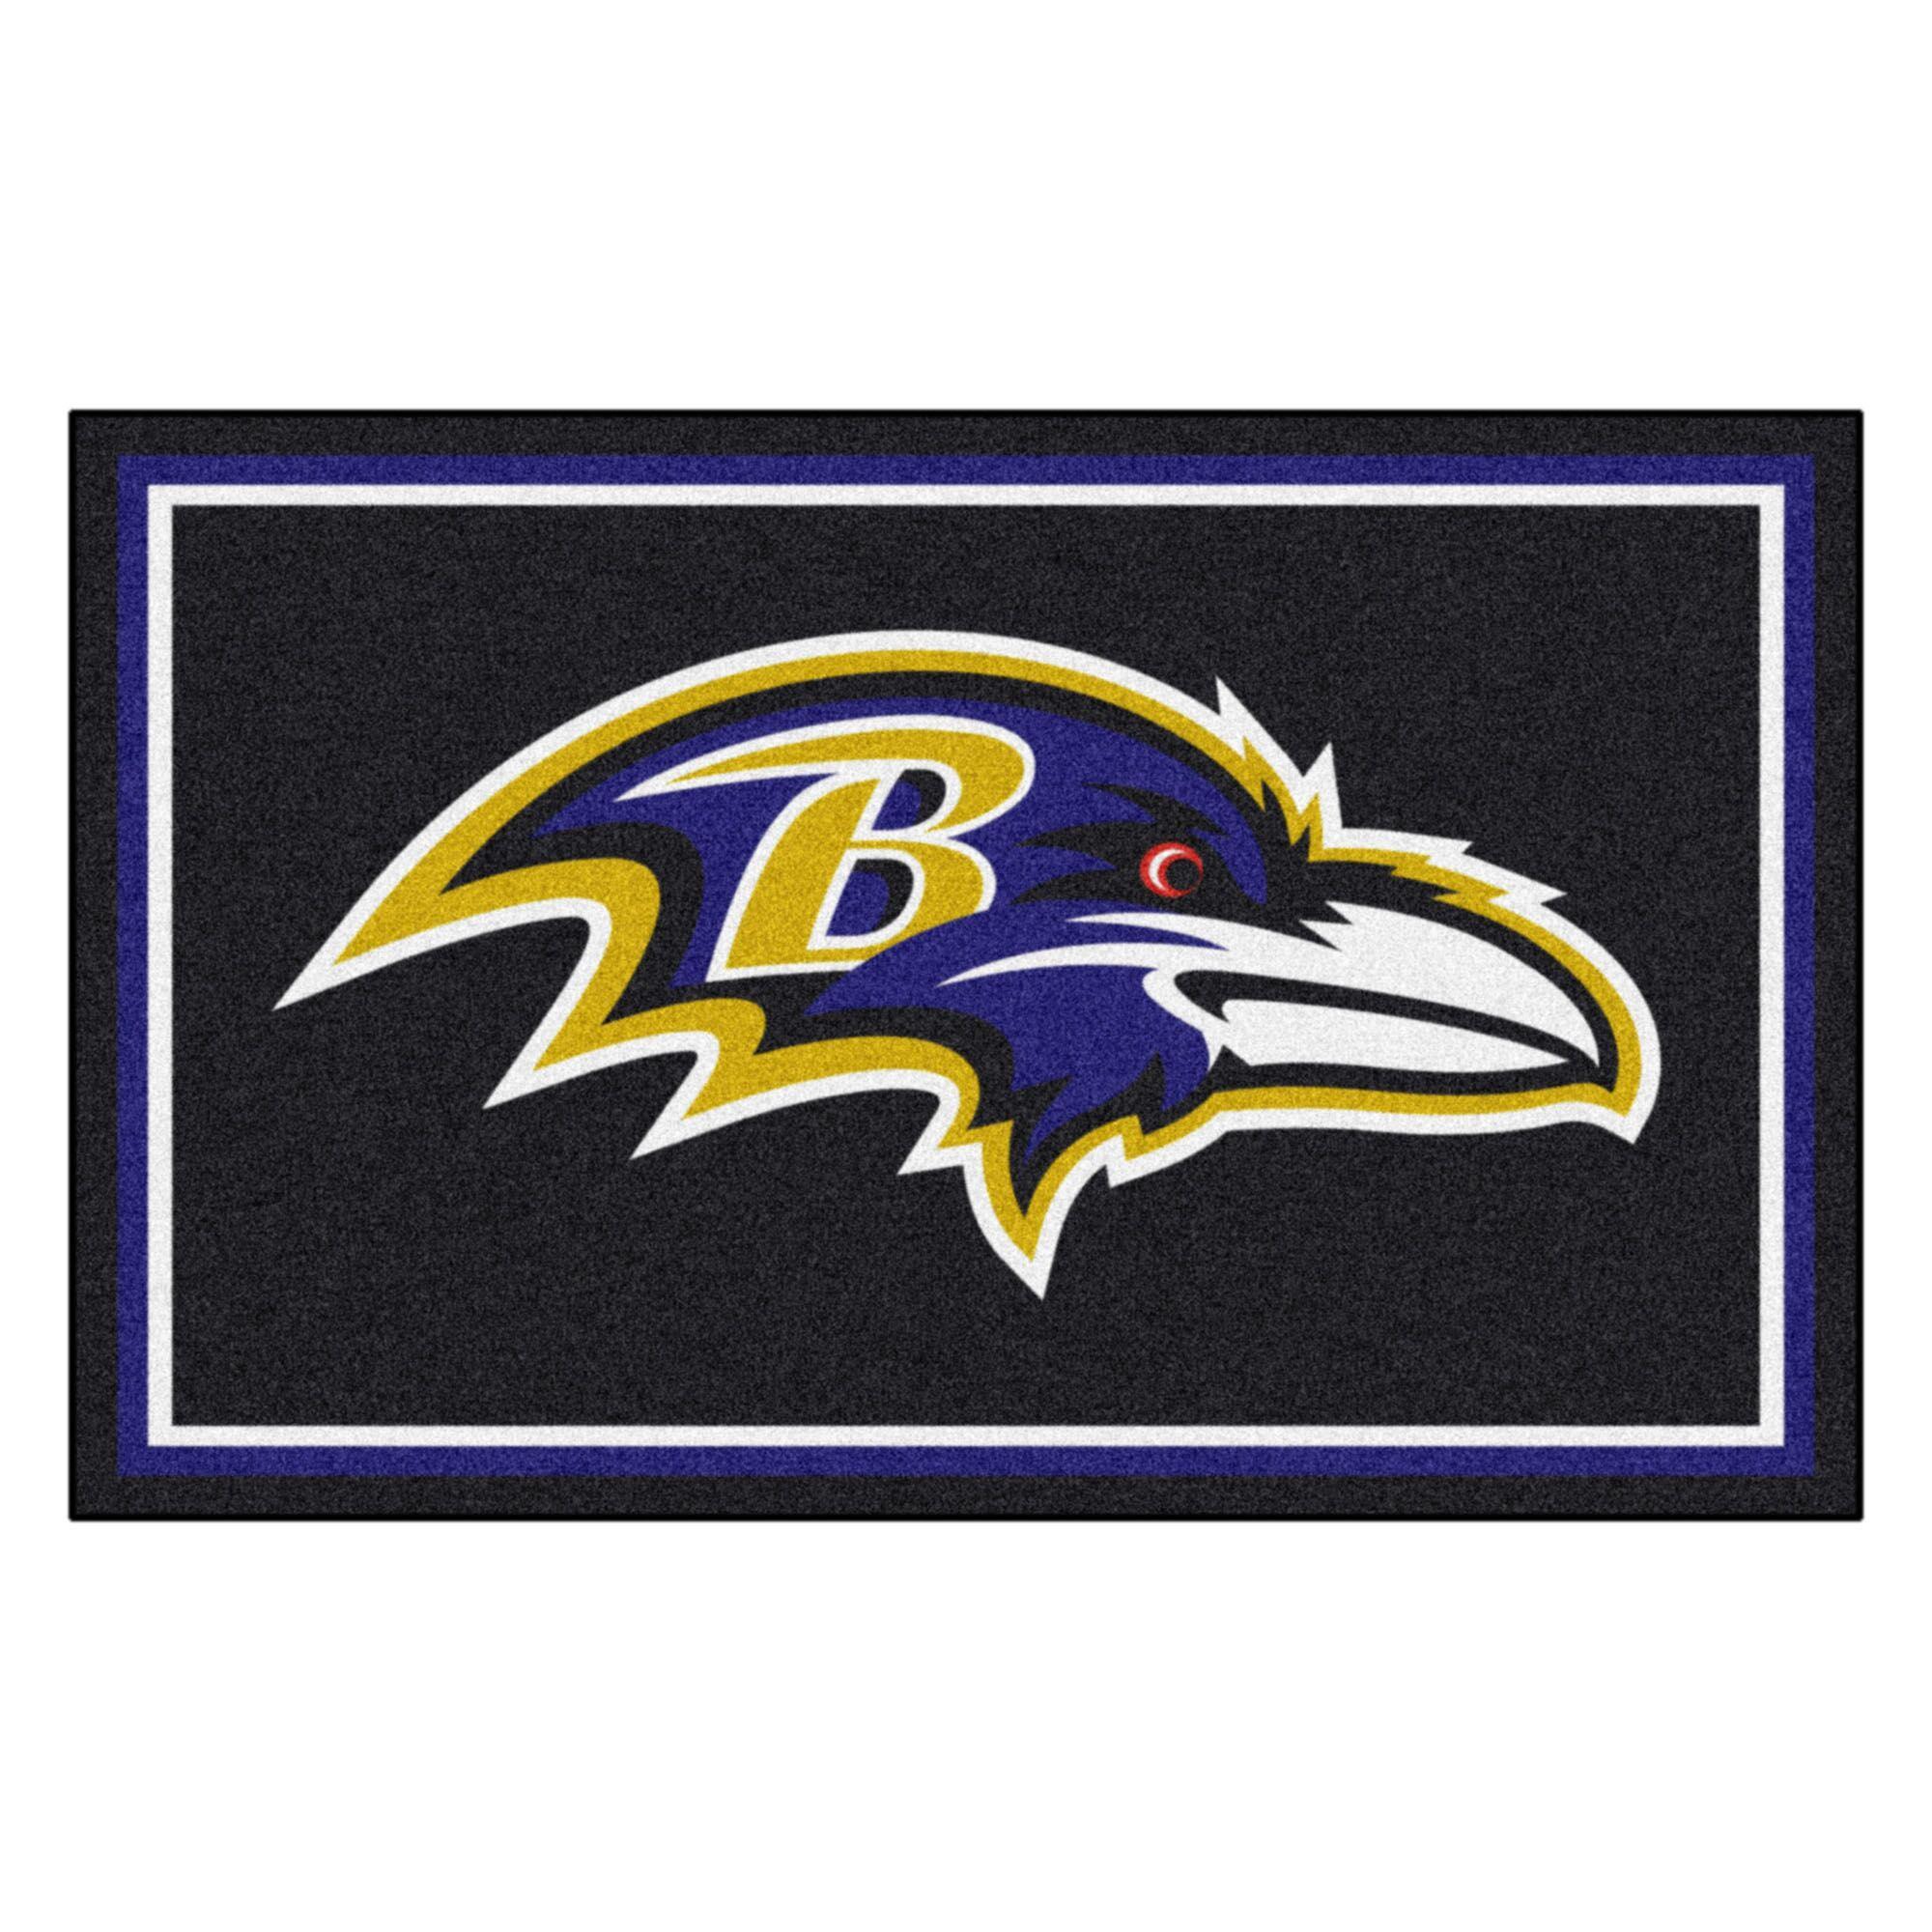 NFL - Baltimore Ravens 4x6 Rug Mat Size: 4' x 6'